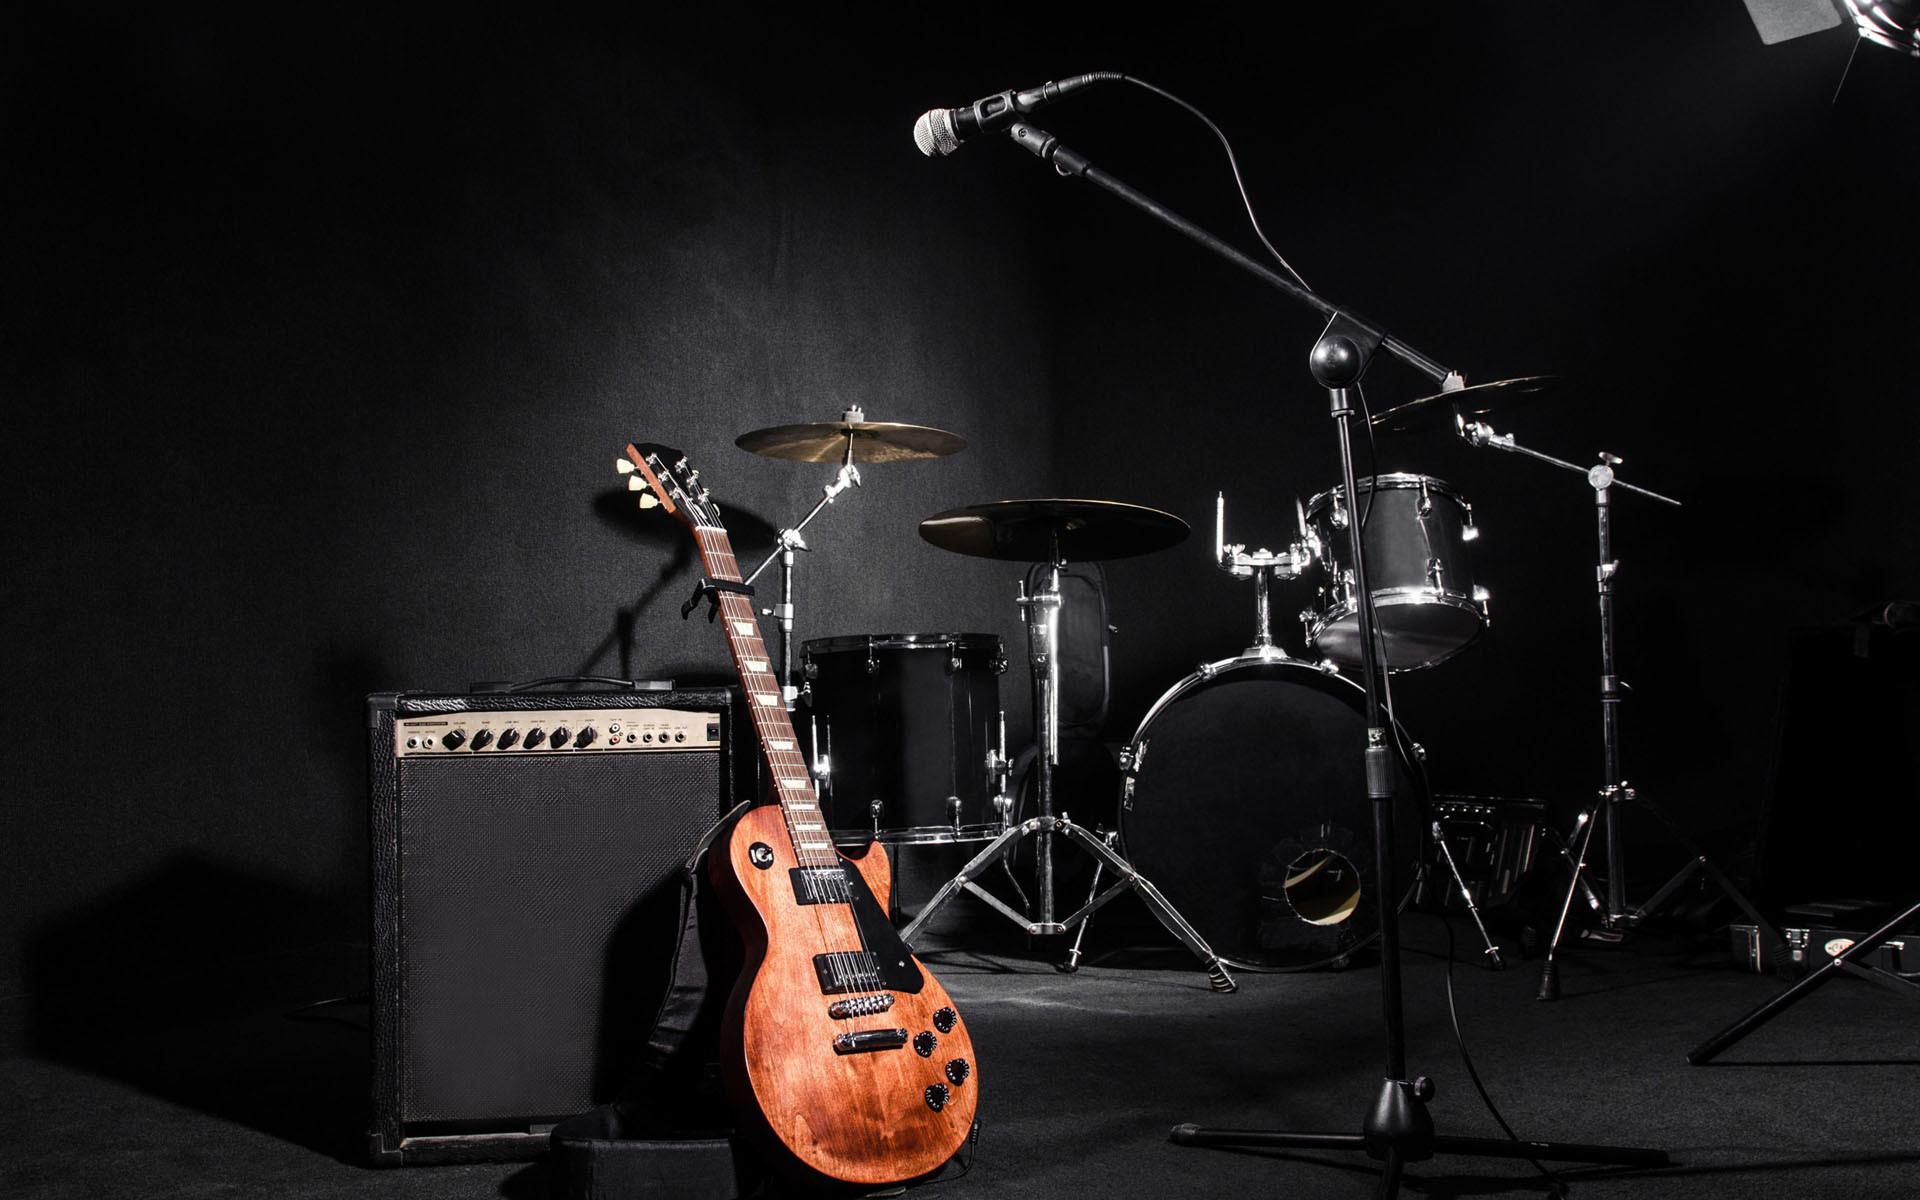 Wallpapers Hd 3d Music: Gibson Guitar Wallpaper HD (54+ Images